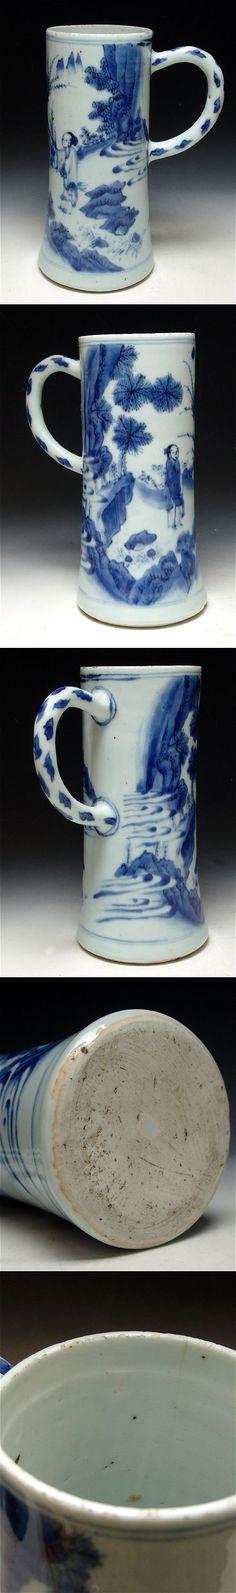 Tankard of slender shape in underglaze Blue and White decoration.  Antique Chinese Porcelain, Ming porcelain.